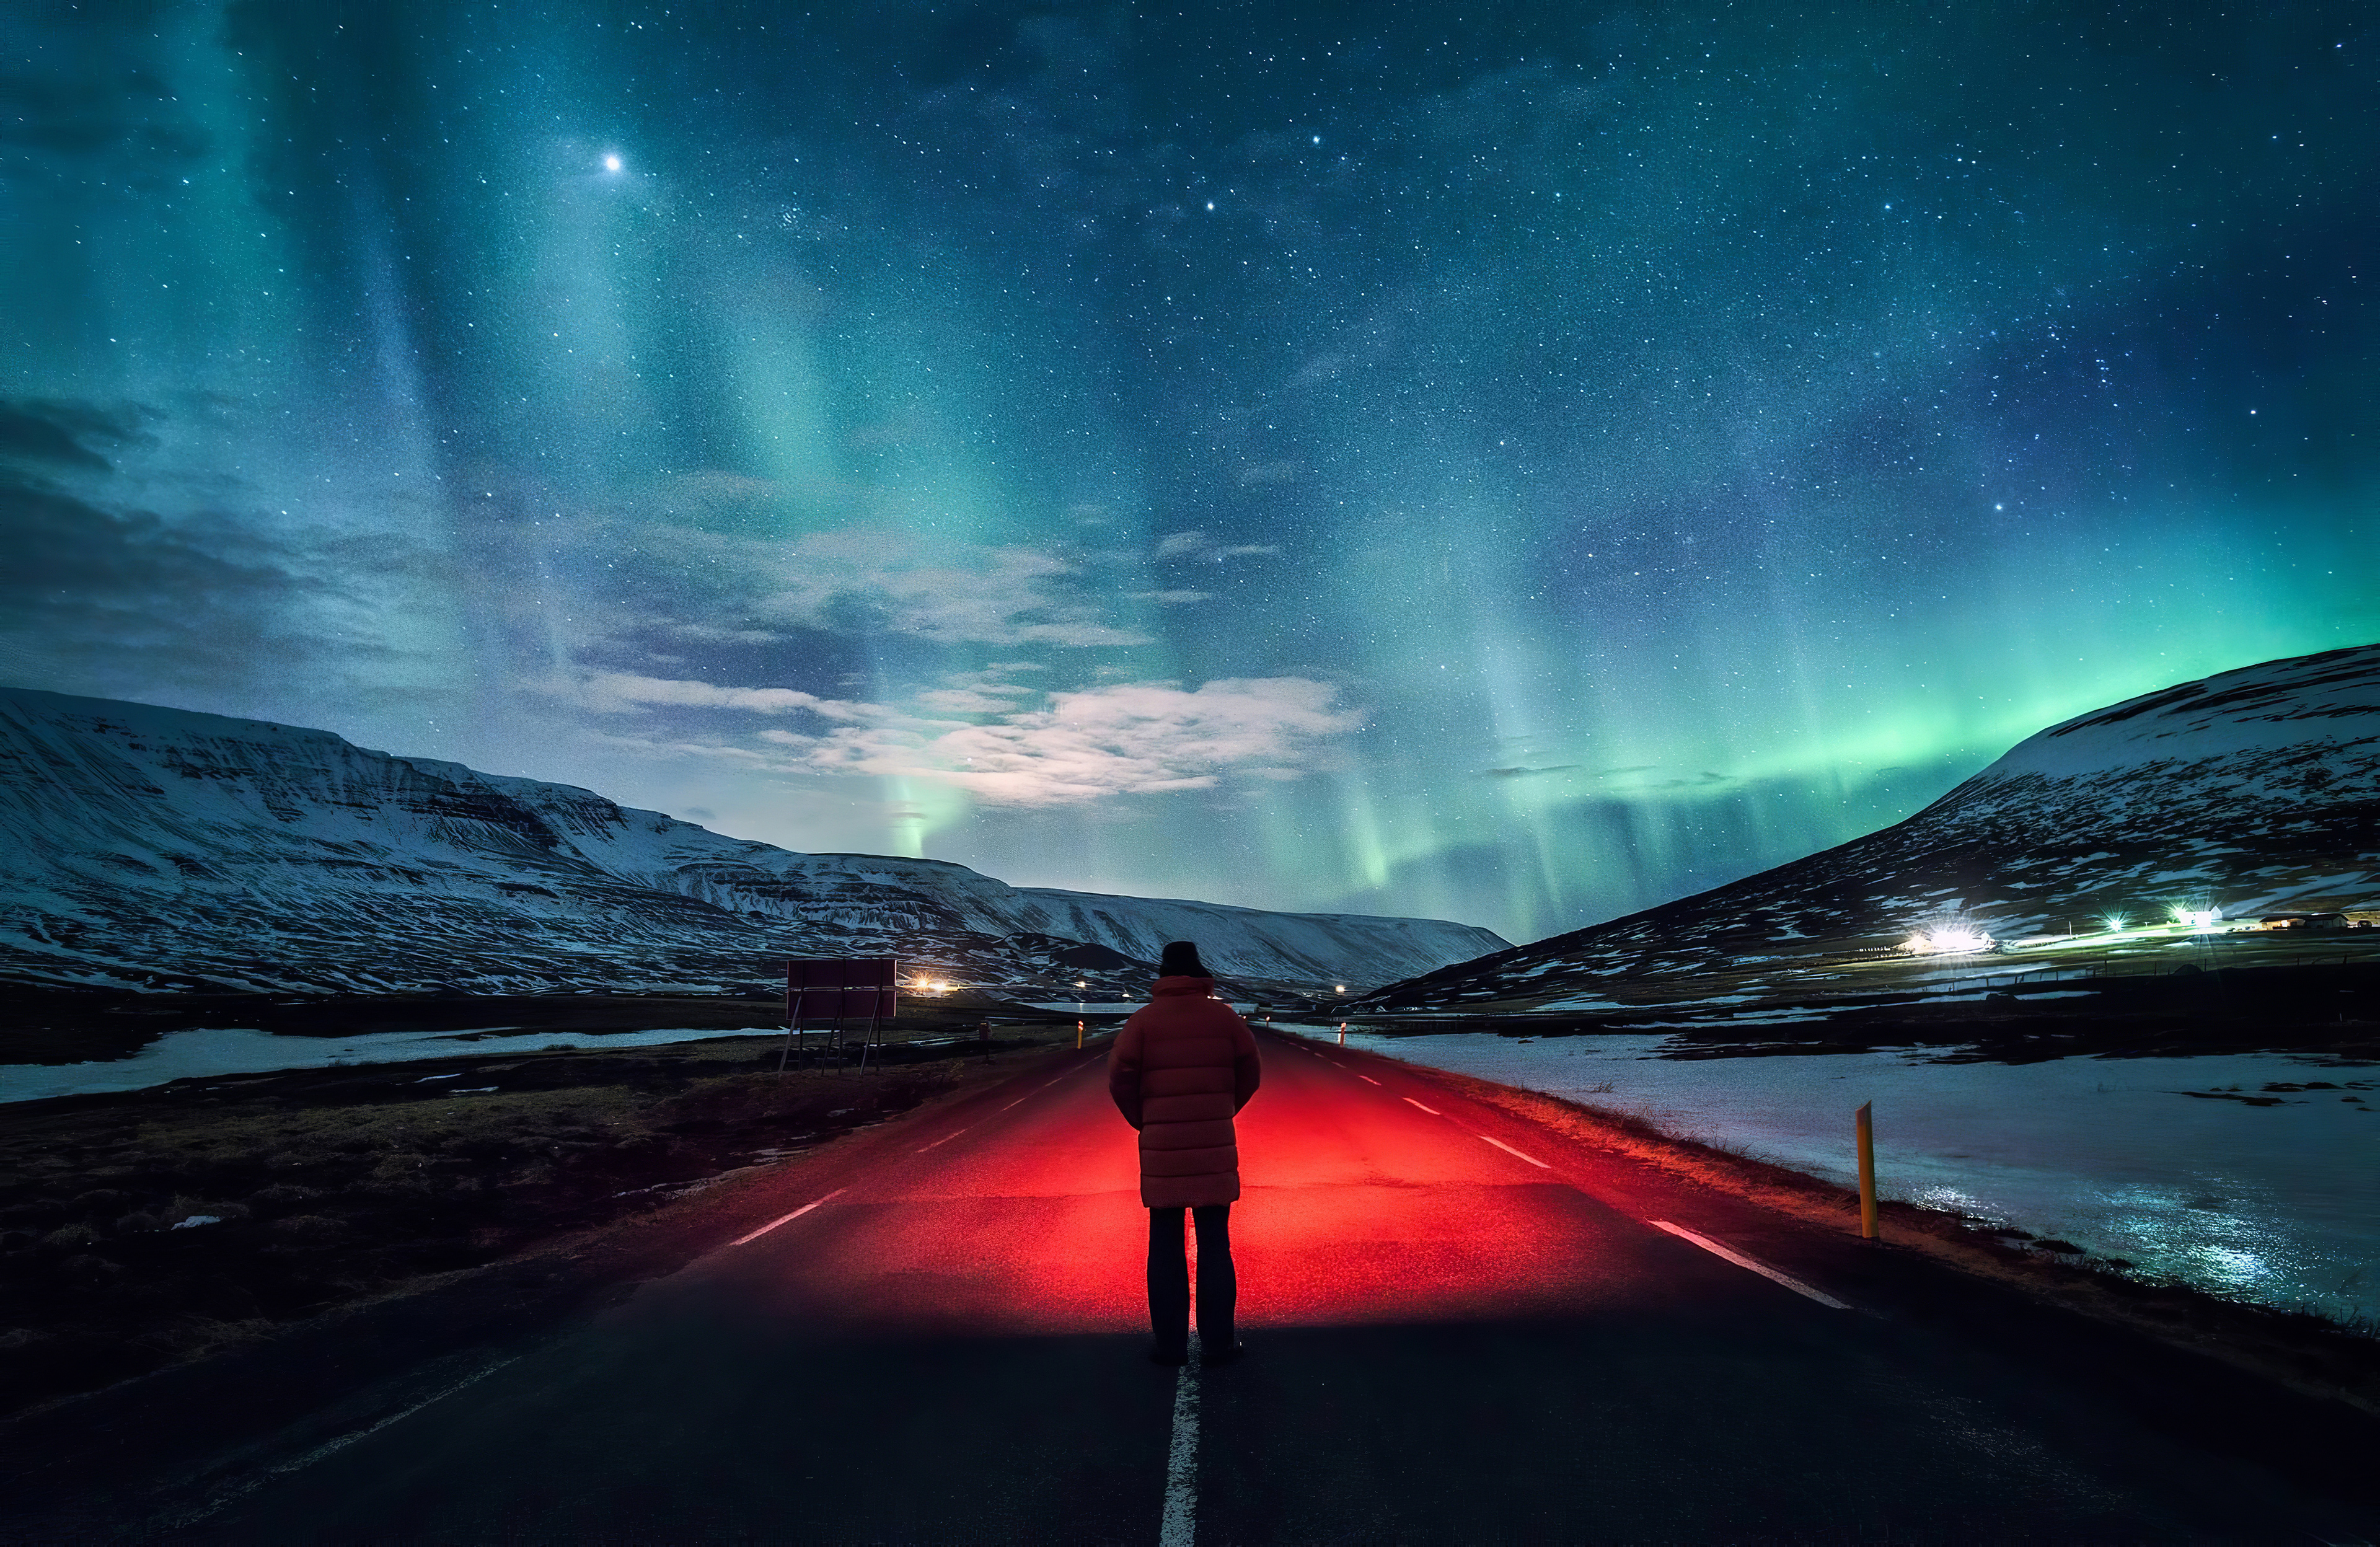 man standing inside road 1574938566 - Man Standing Inside Road -